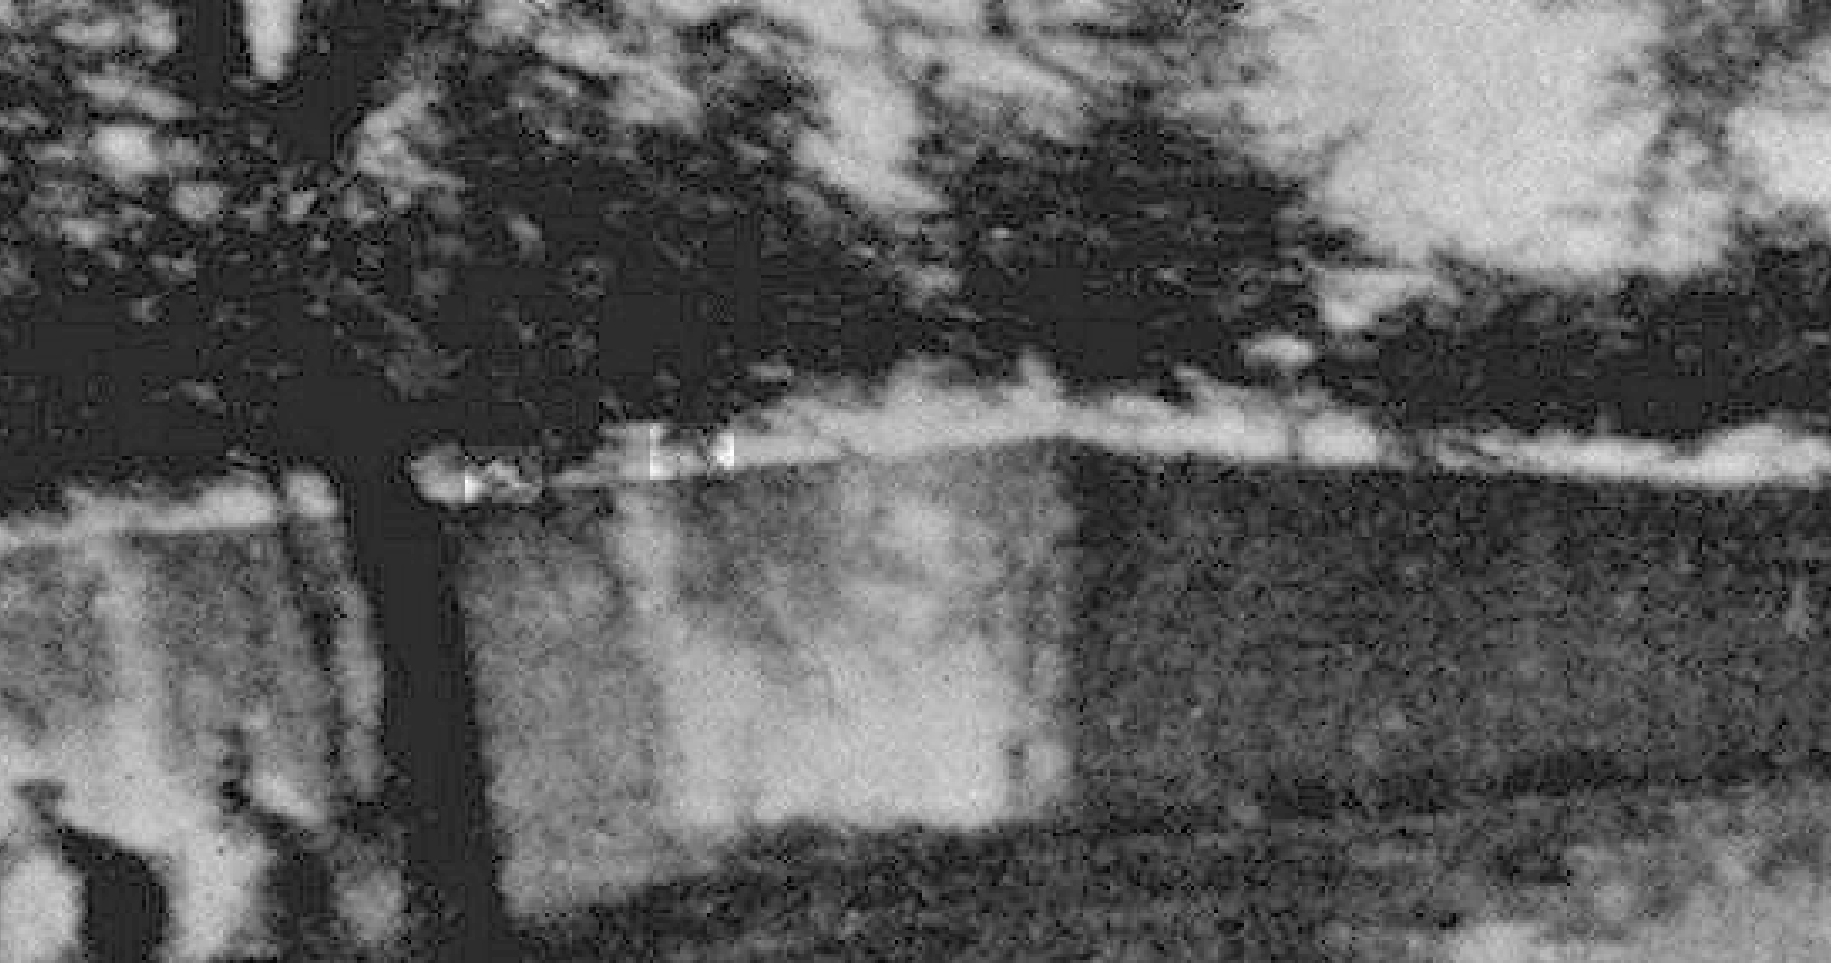 shooters-in-morman-polaroid.jpg